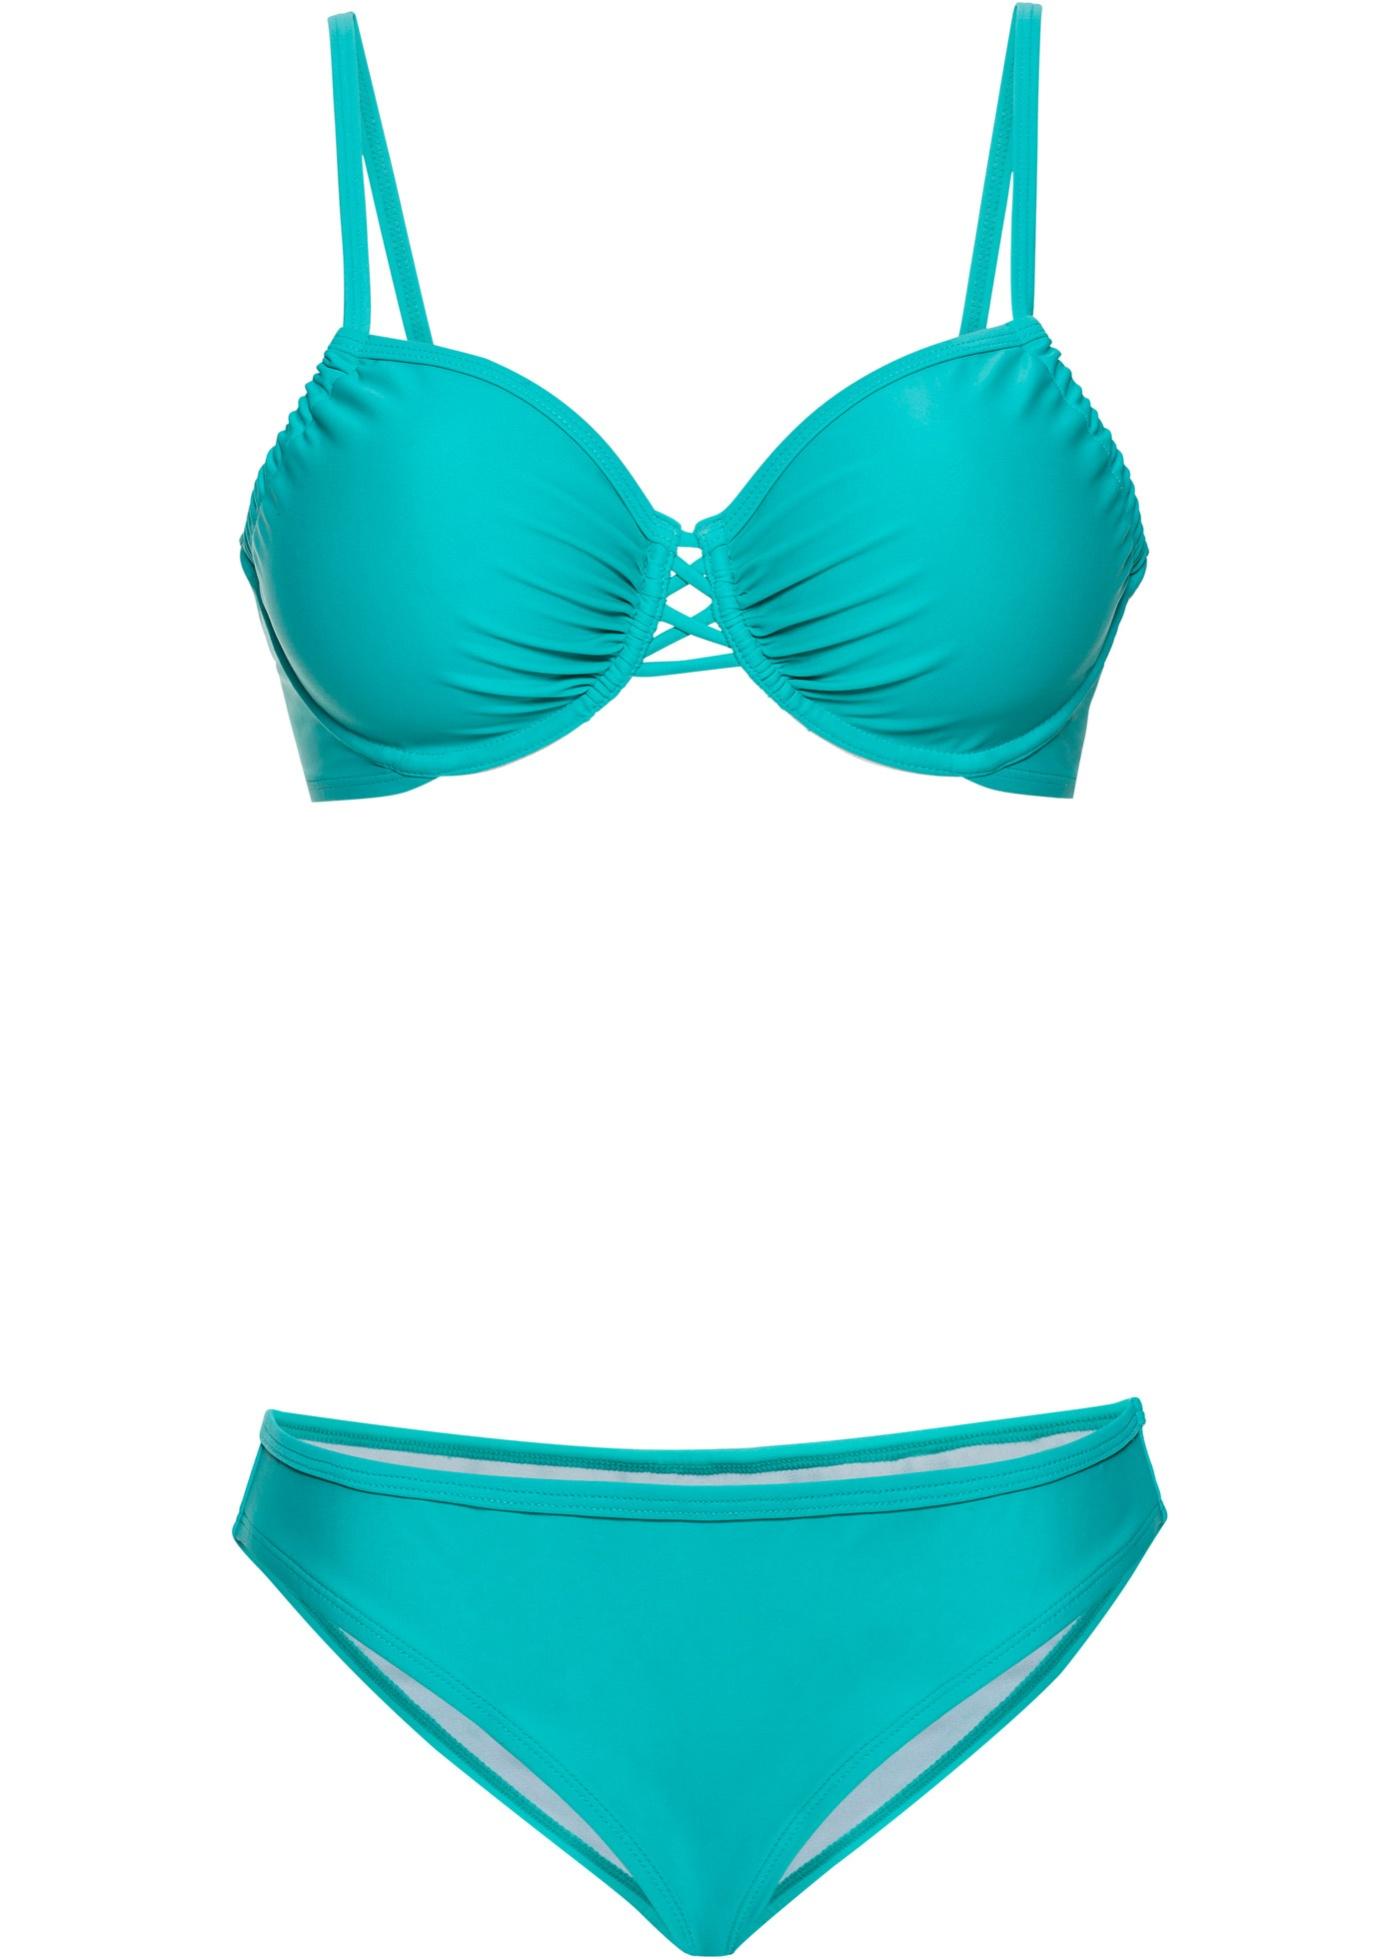 Bügel Bikini (2-tlg. Set), Cup C